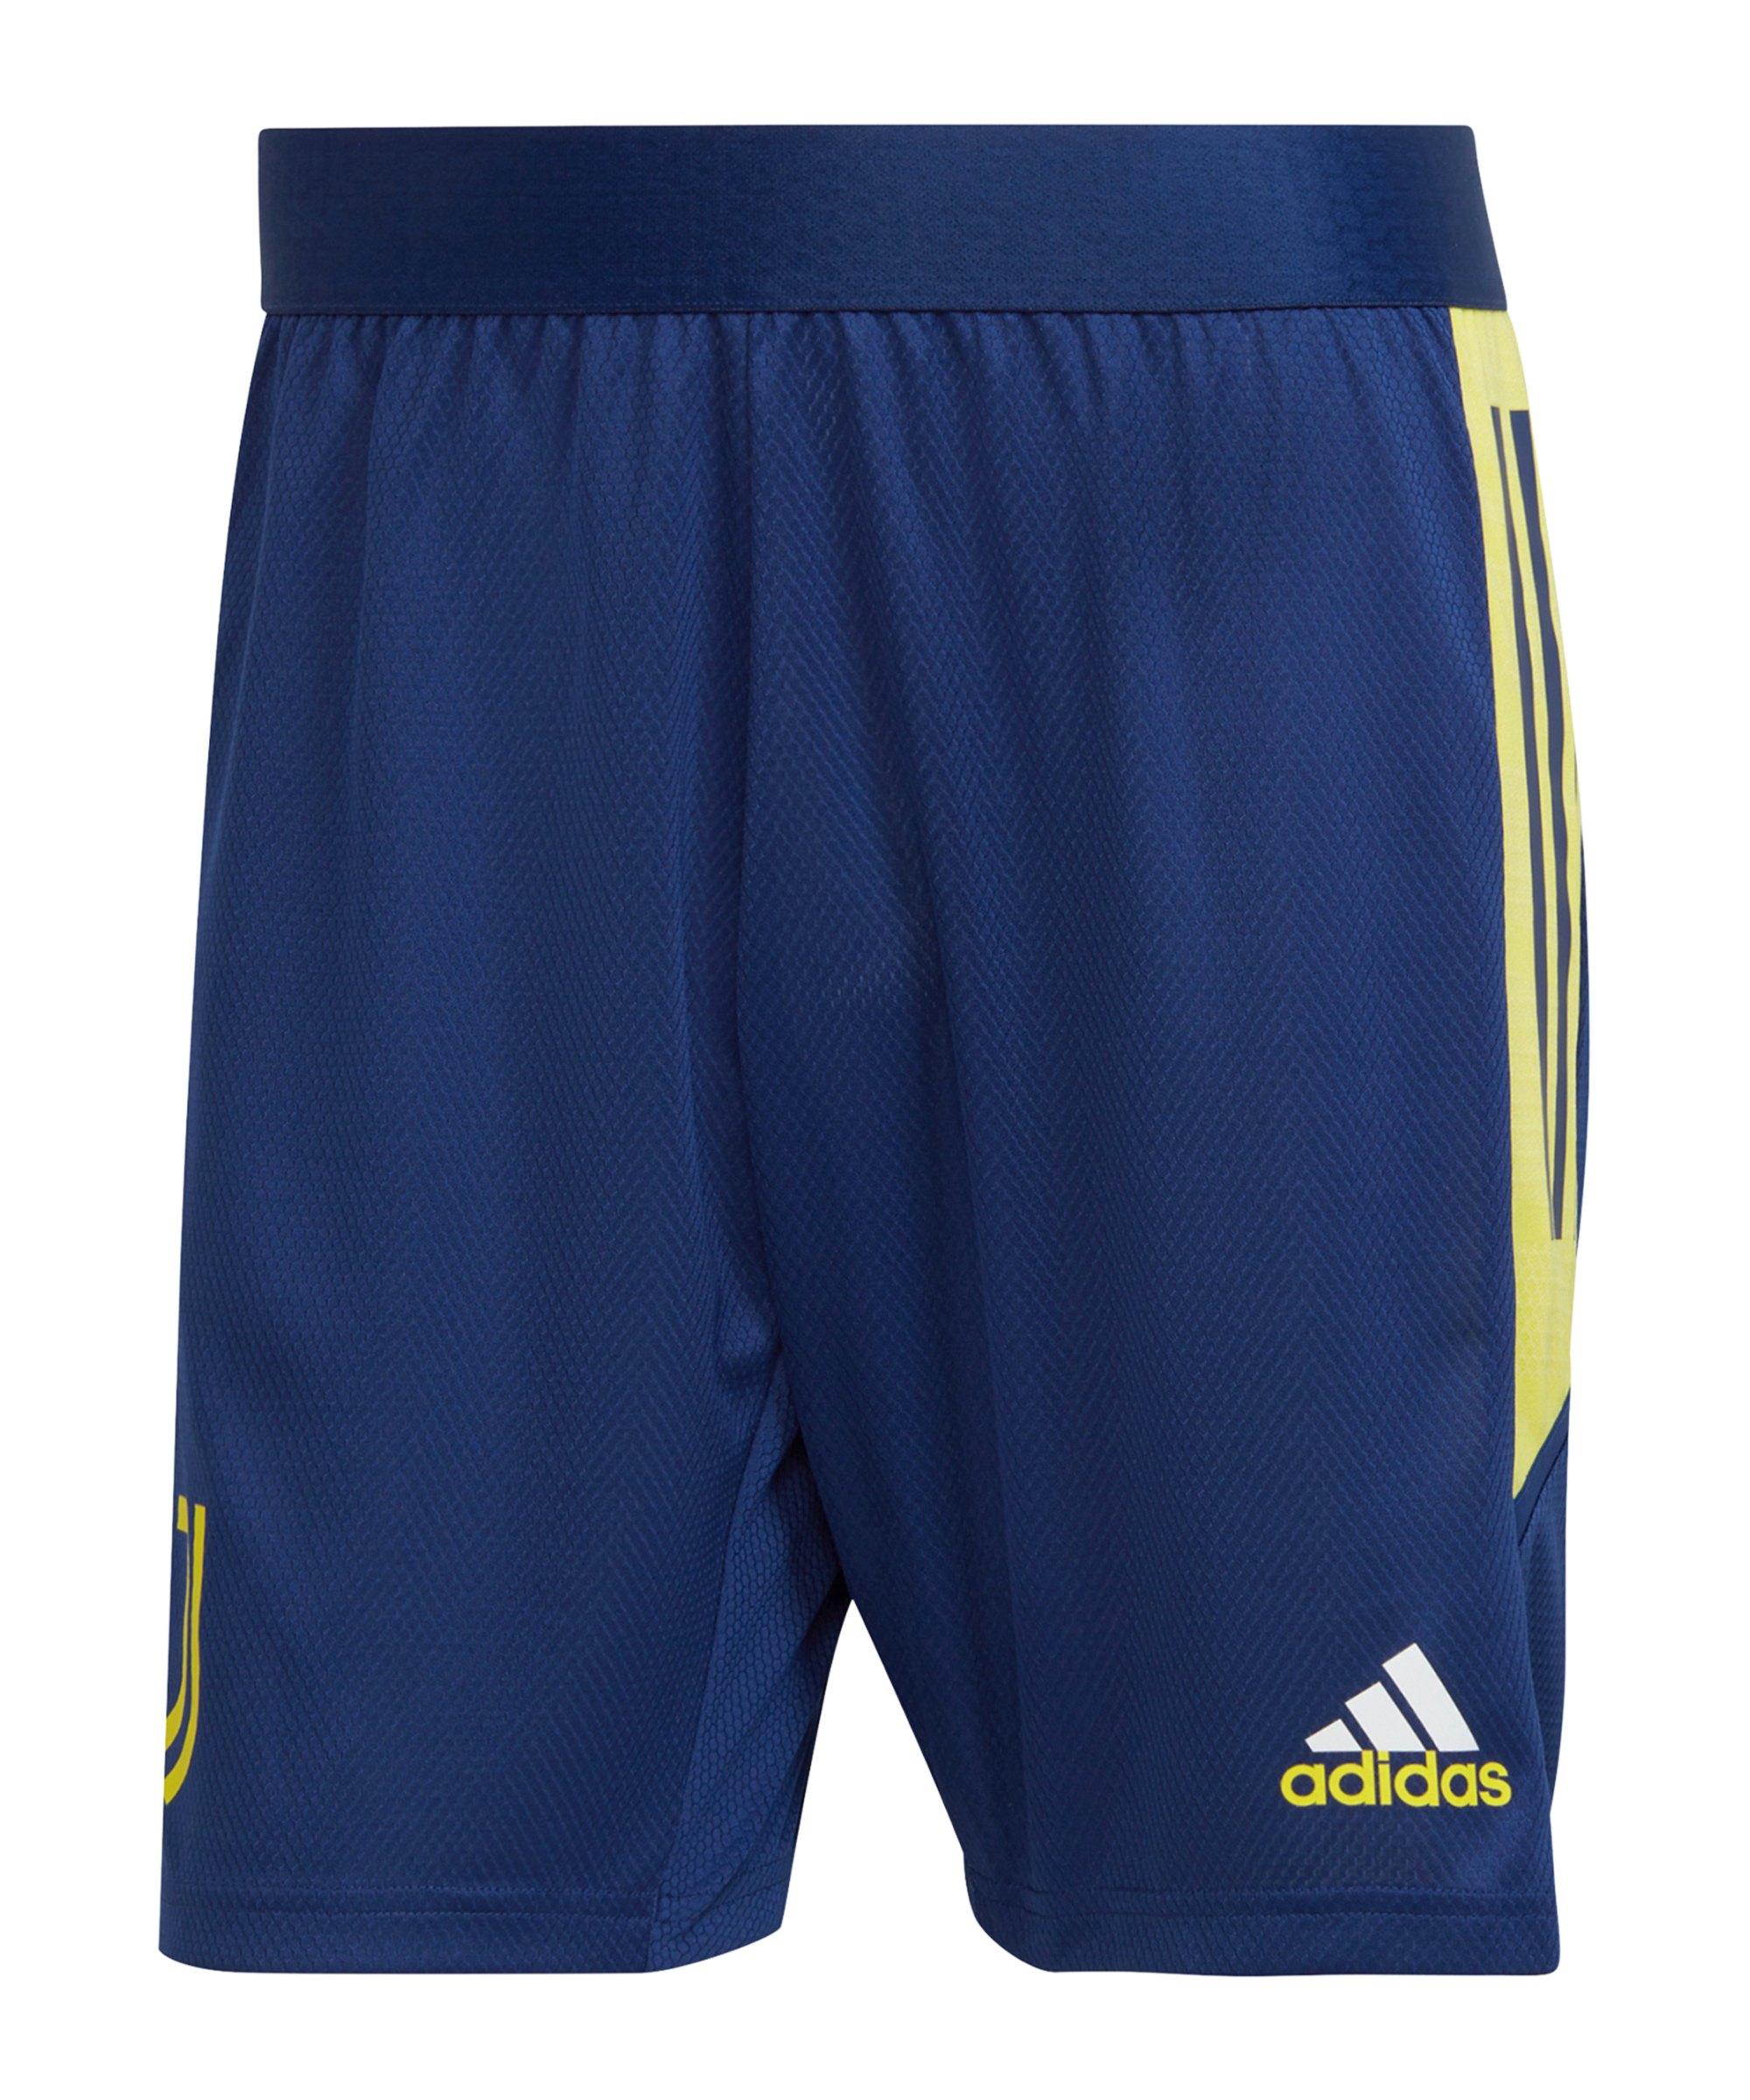 adidas Juventus Turin Trainingsshort Blau Gelb - blau